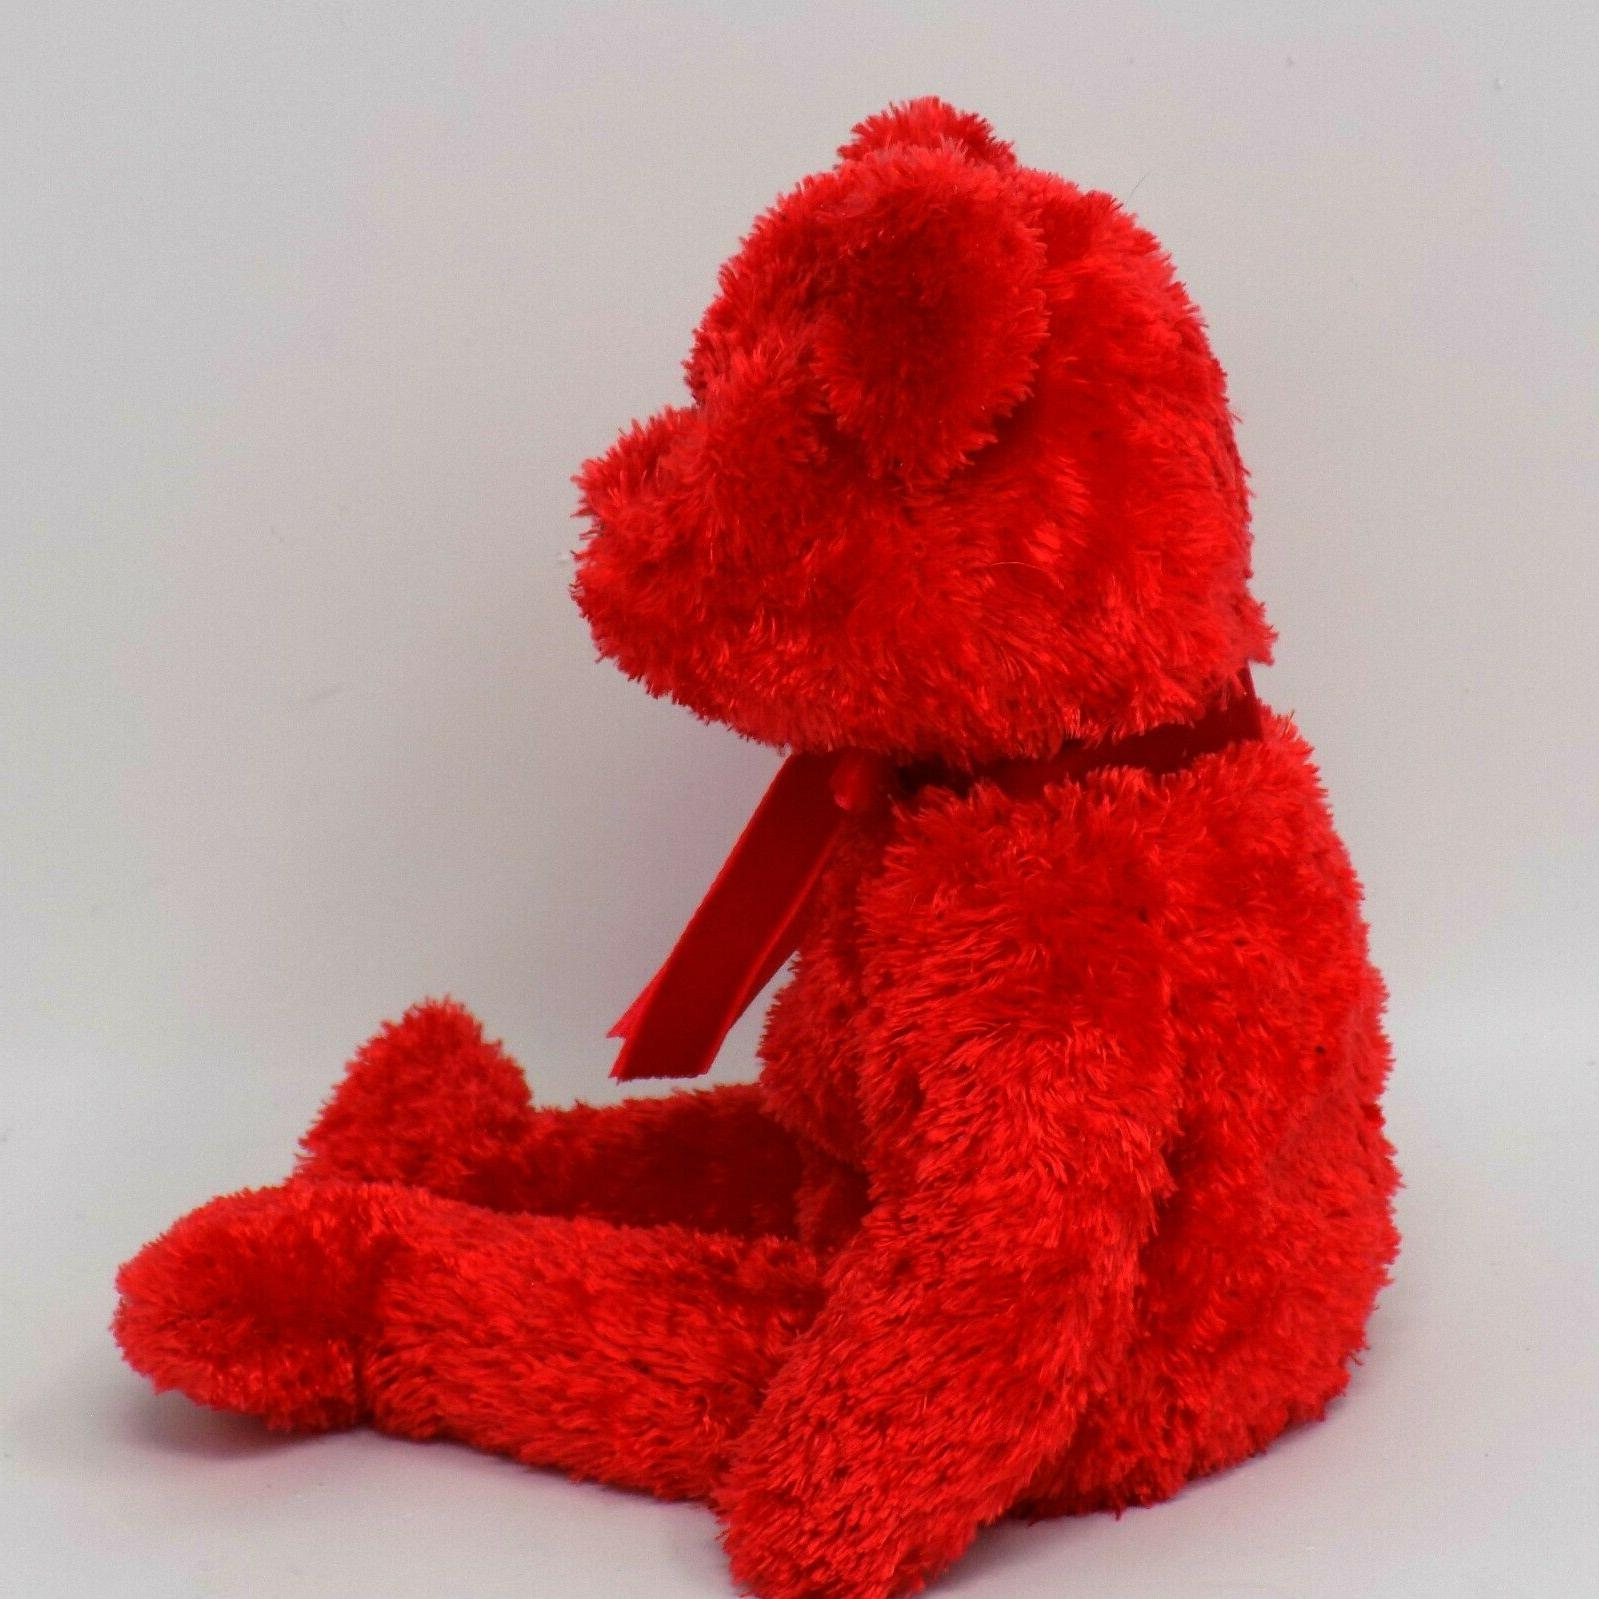 Ty Bear Stuffed Animal Plush Toy